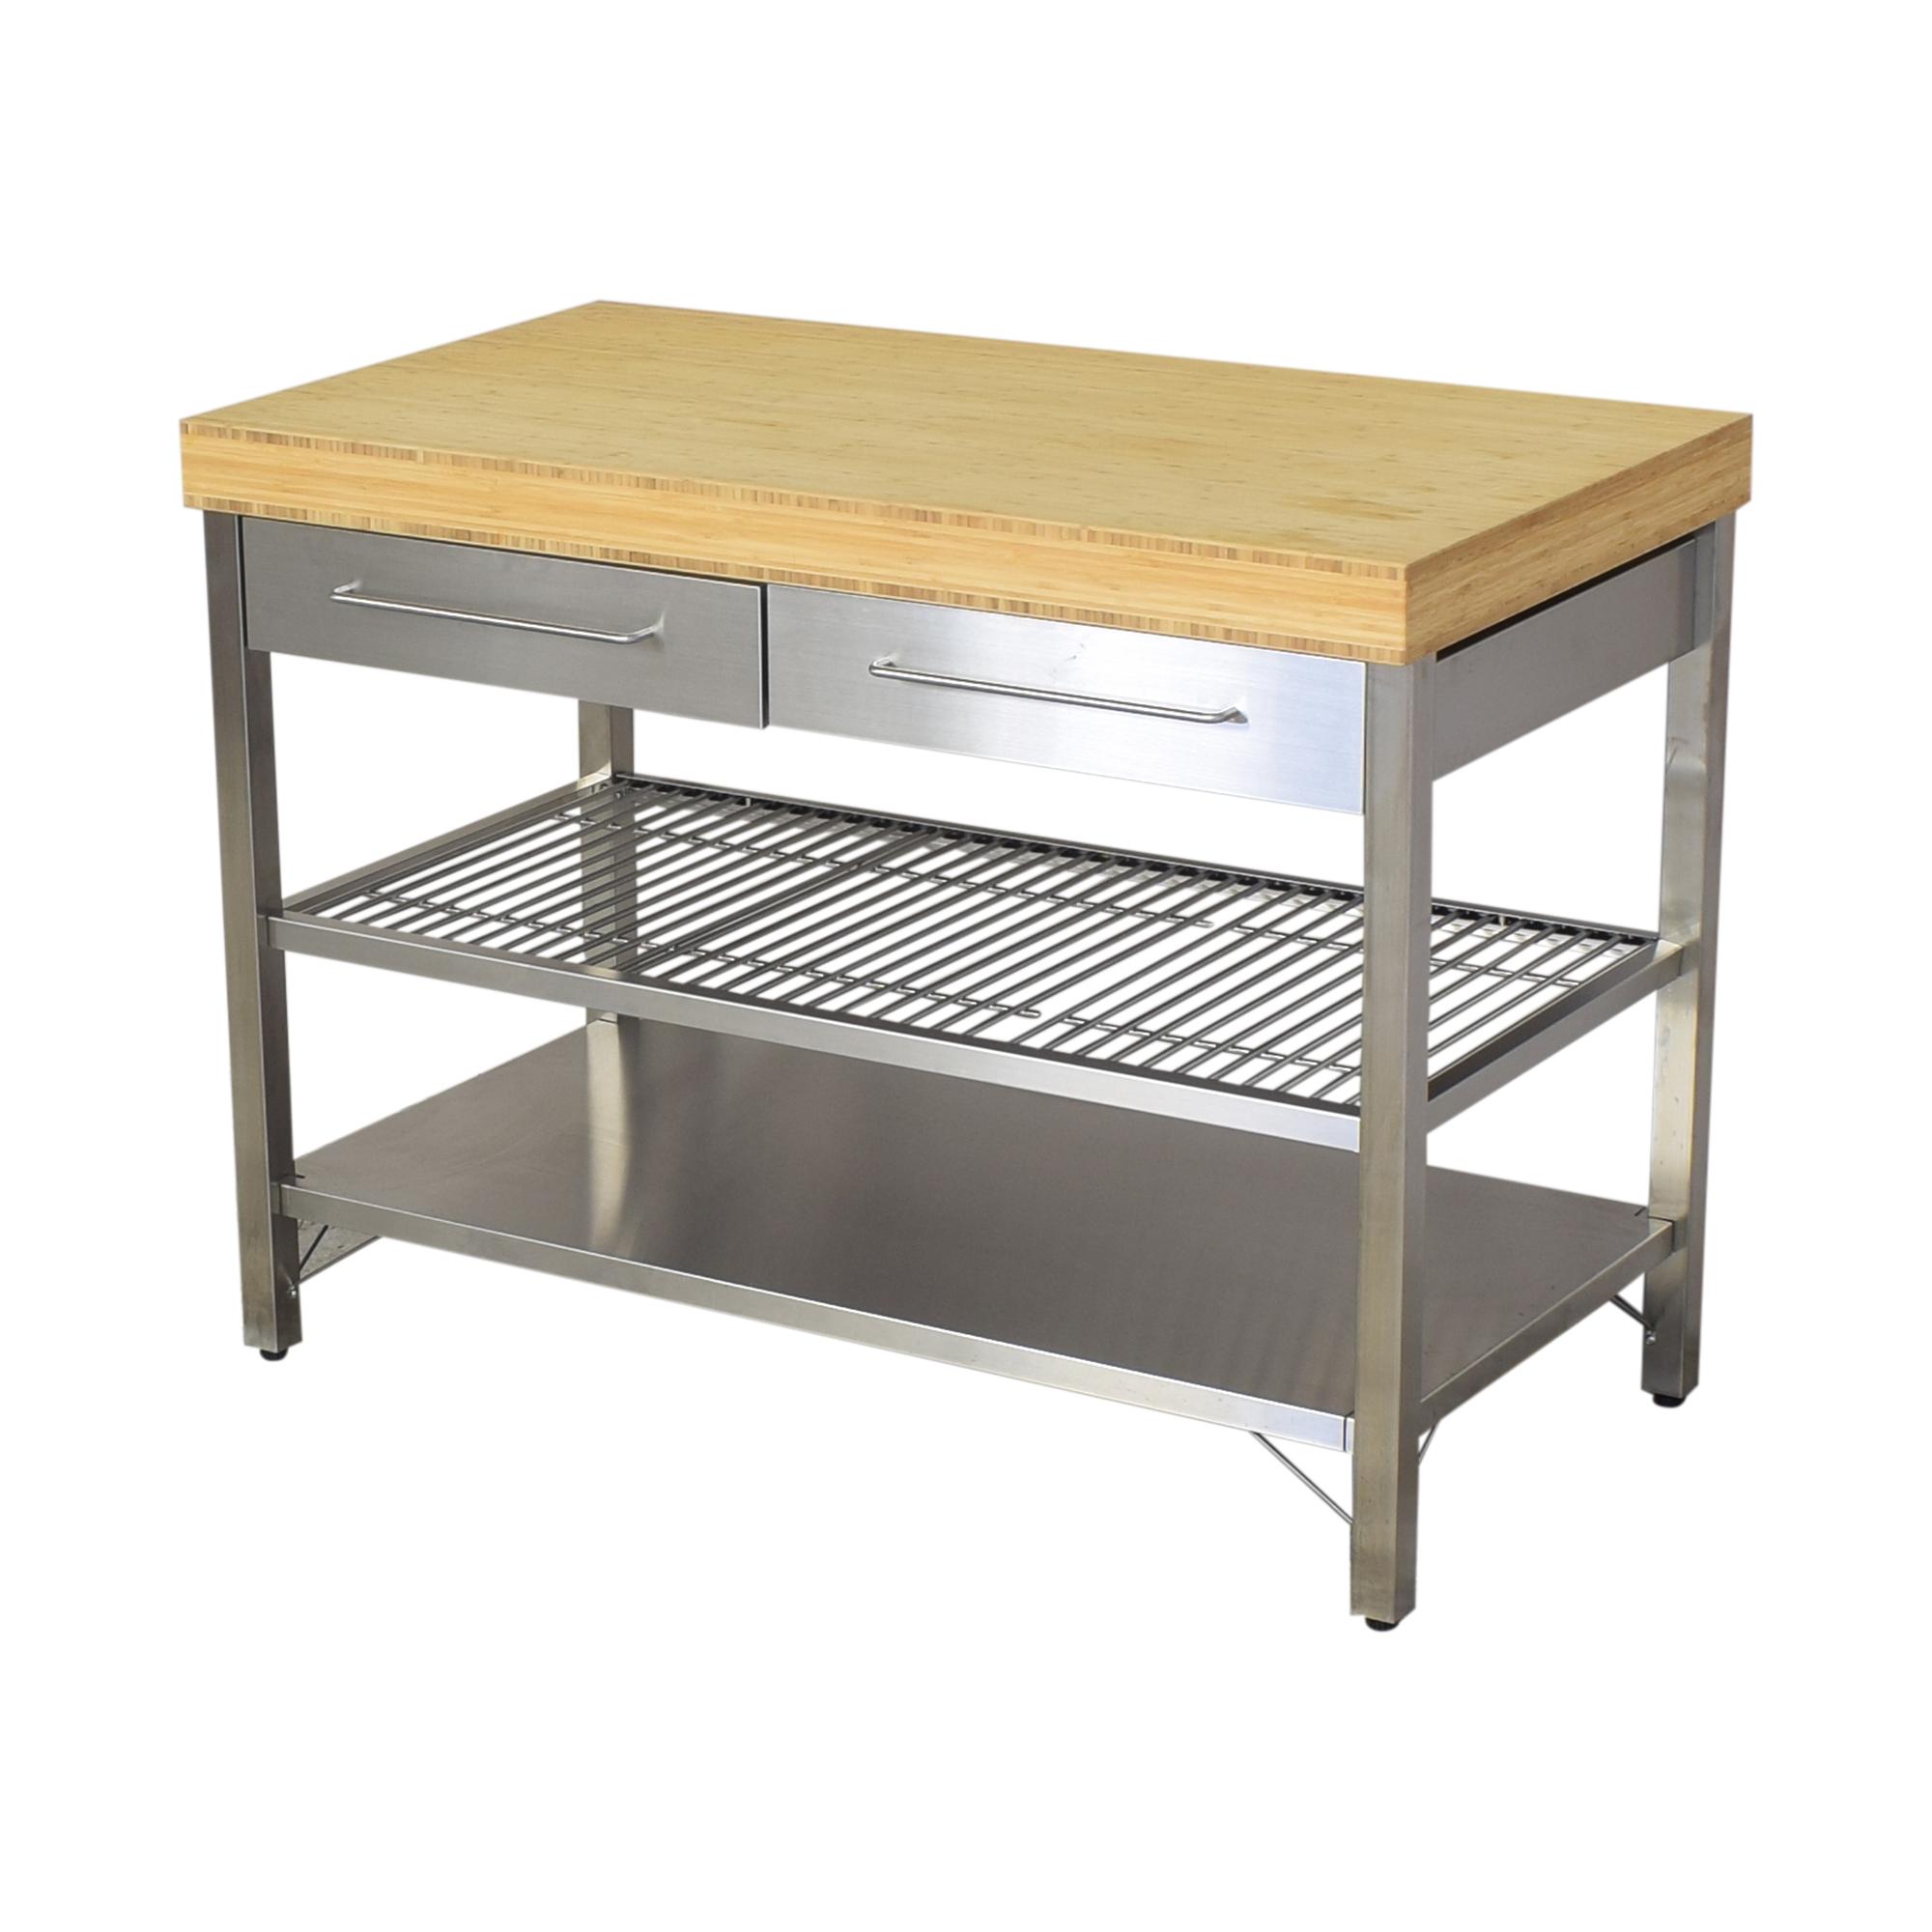 IKEA RIMFORSA Work Bench / Utility Tables